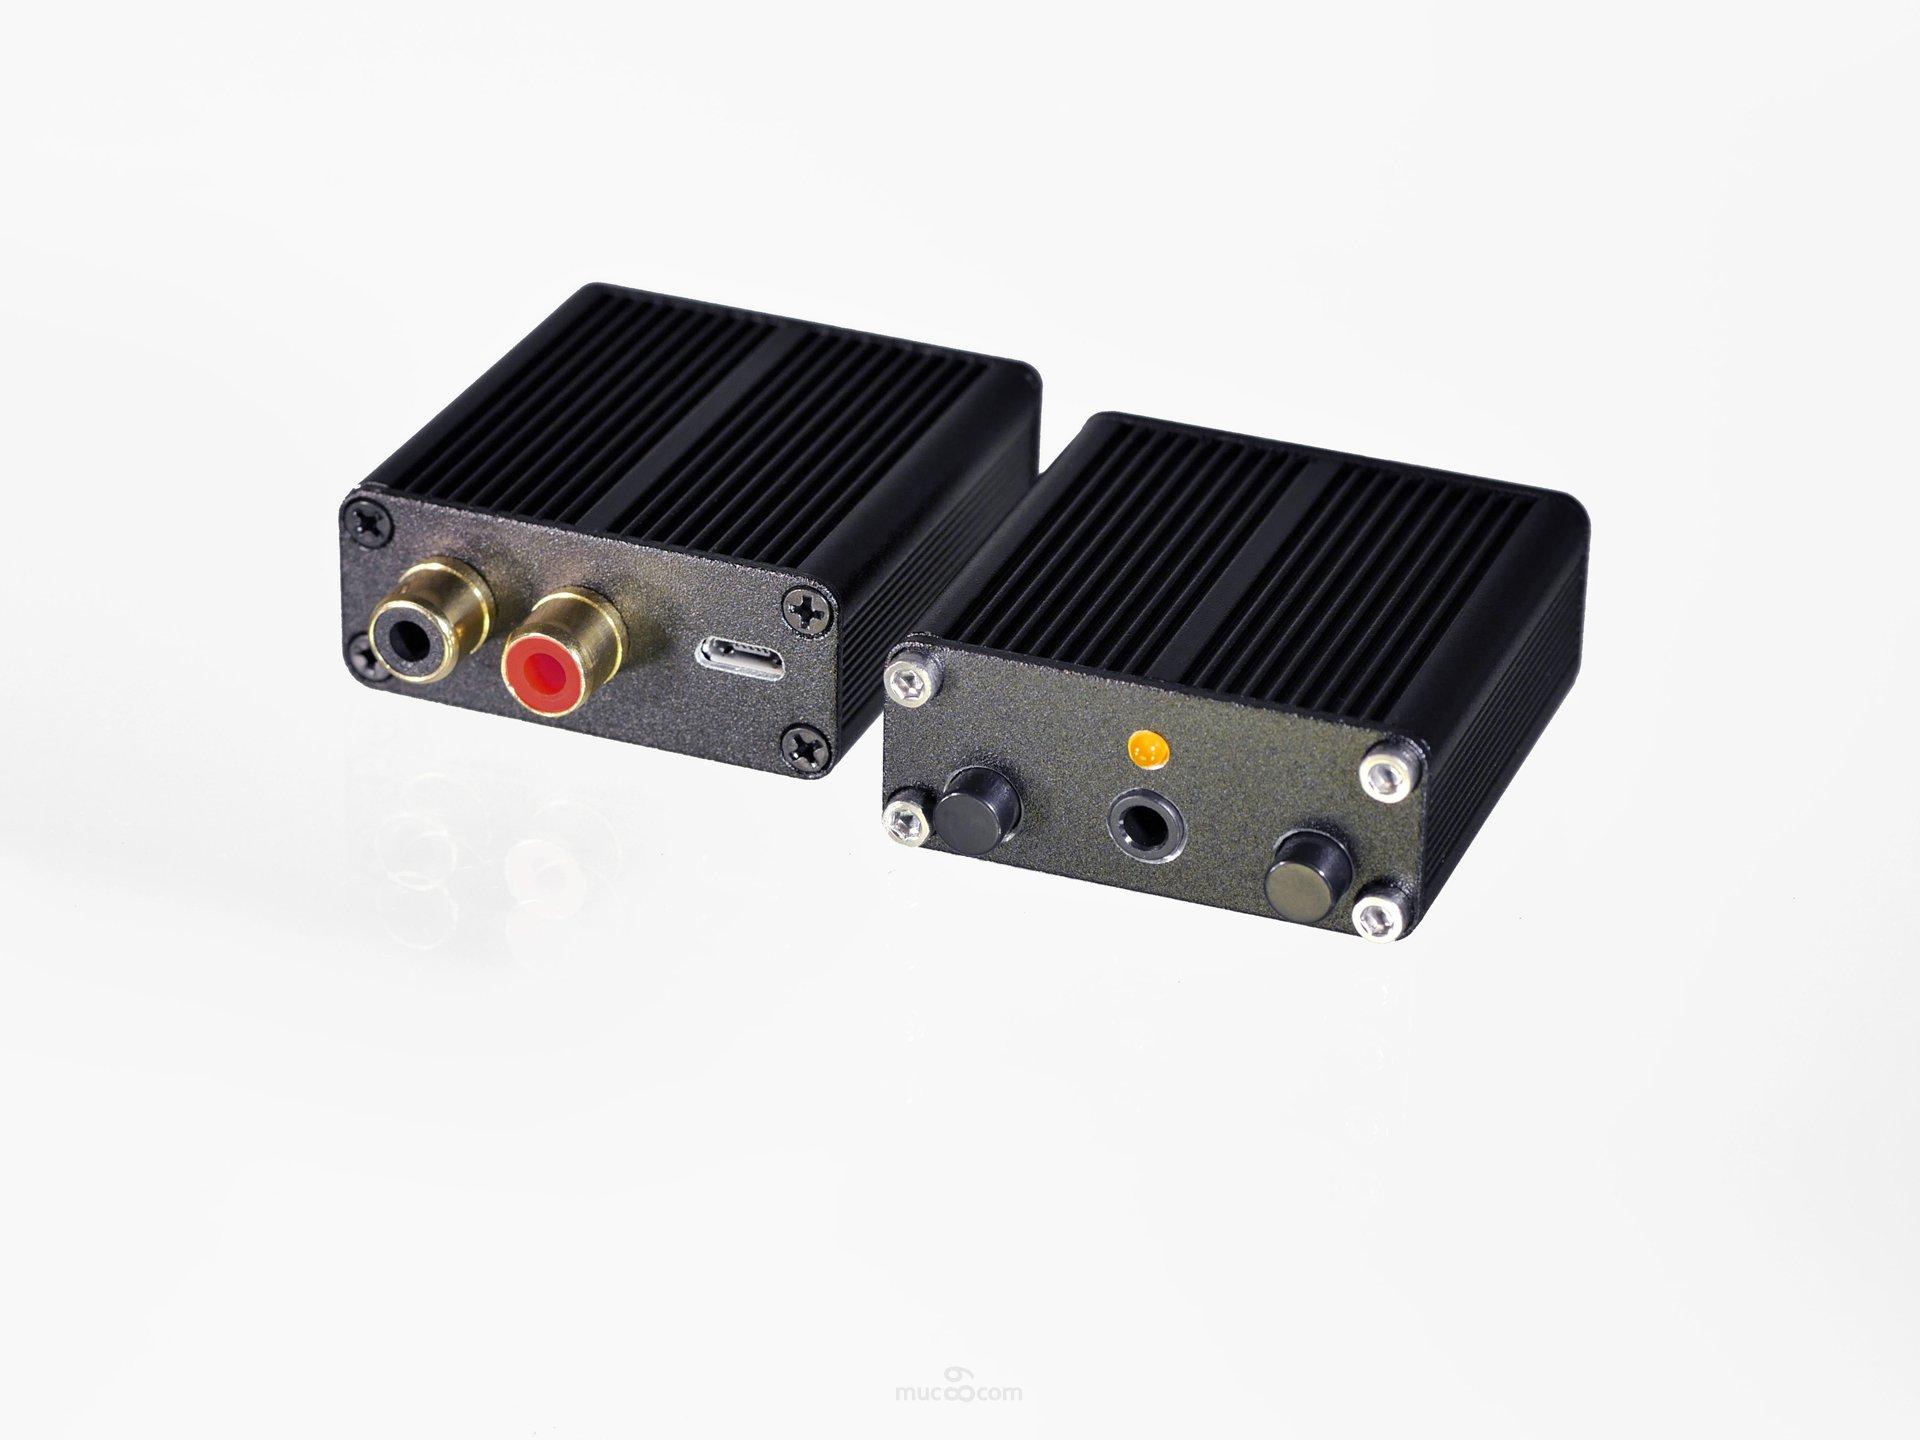 HIRESFI USB DAC ESS9023 muc89